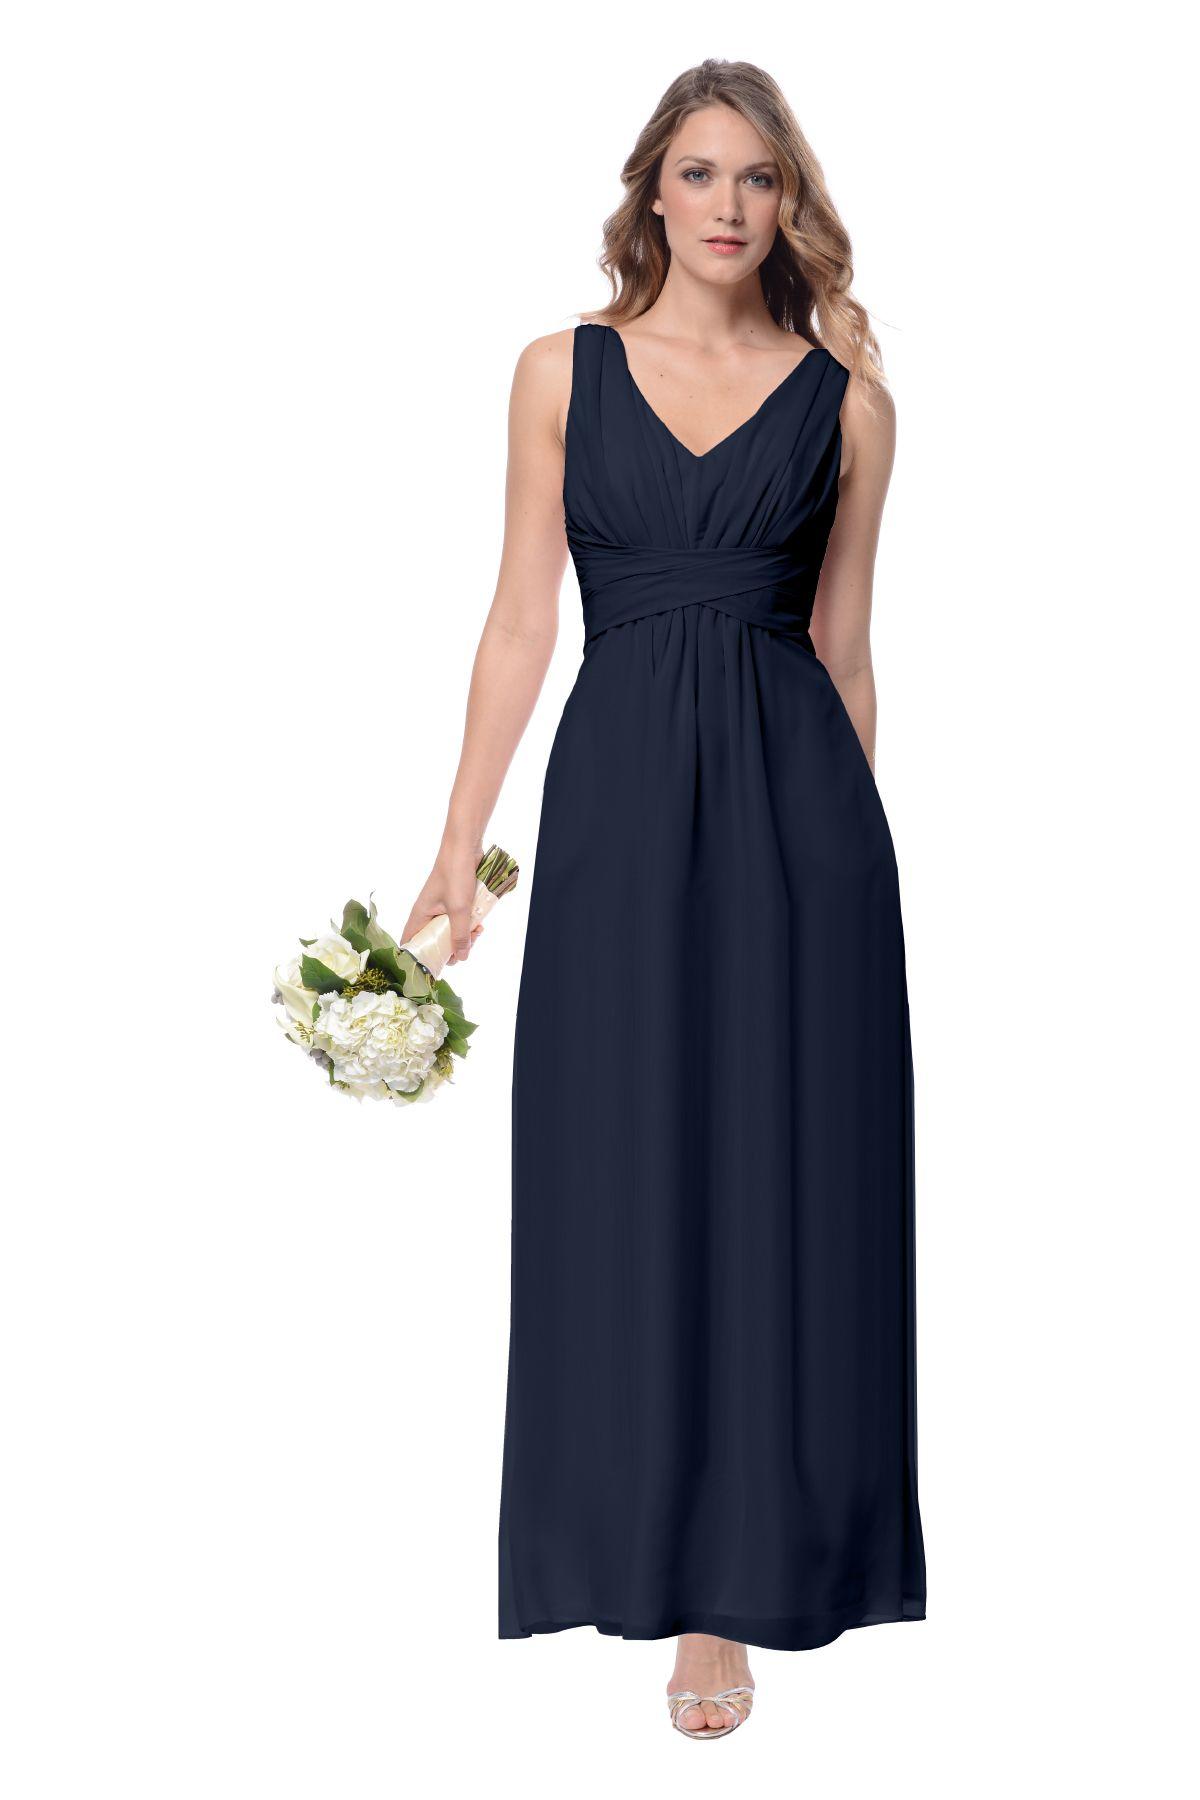 Scarlett dahlia party fashion and bridal parties shop dove dahlia bridesmaid dress scarlett in poly chiffon at weddington way find ombrellifo Images